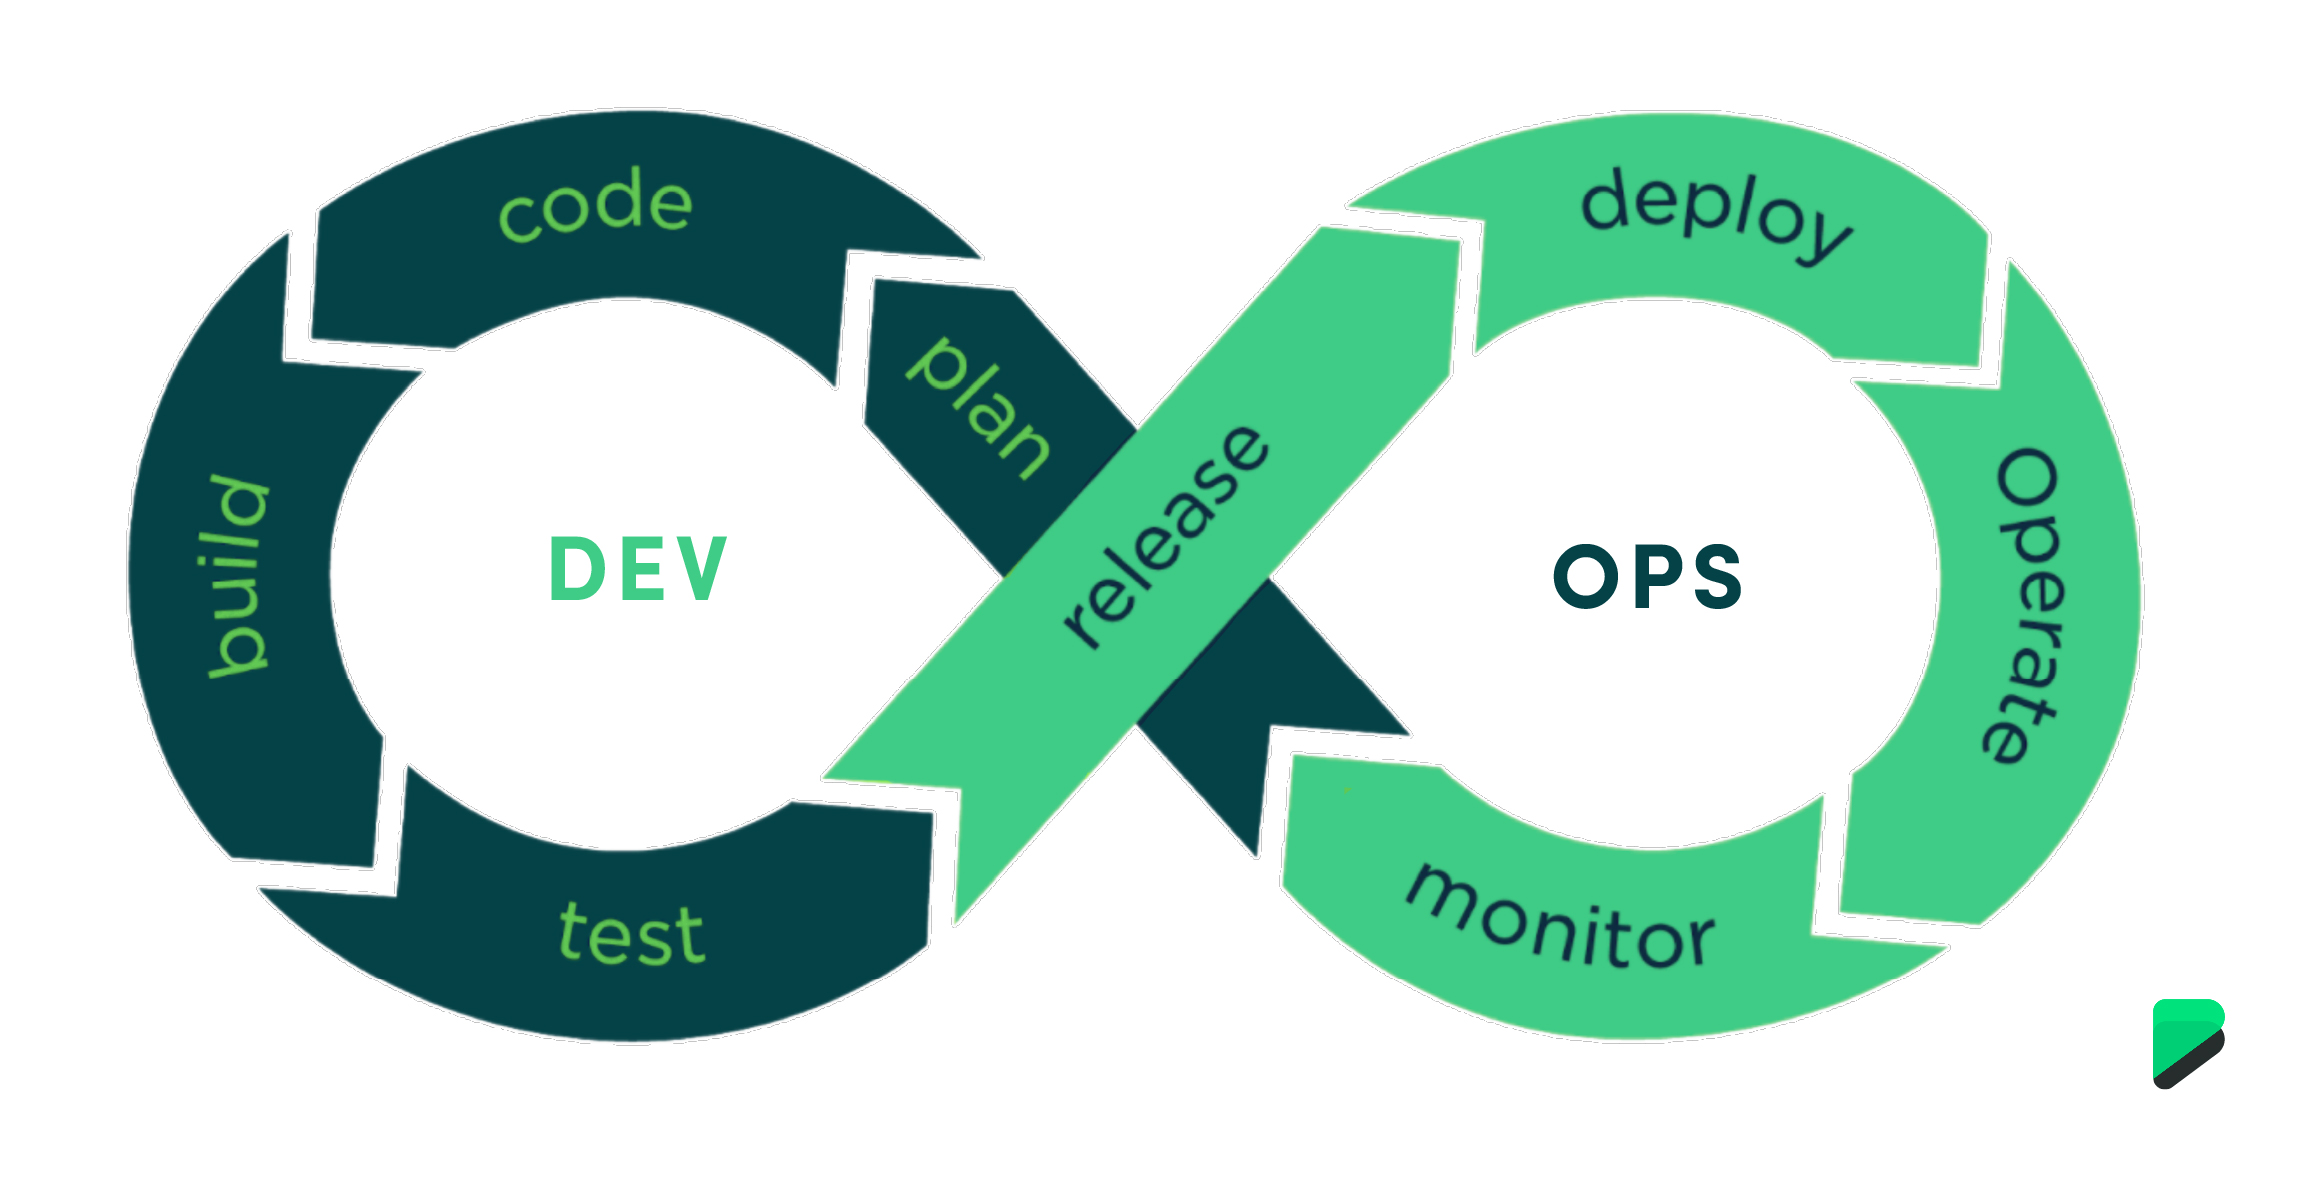 DevOps diagram and its iterative, agile nature